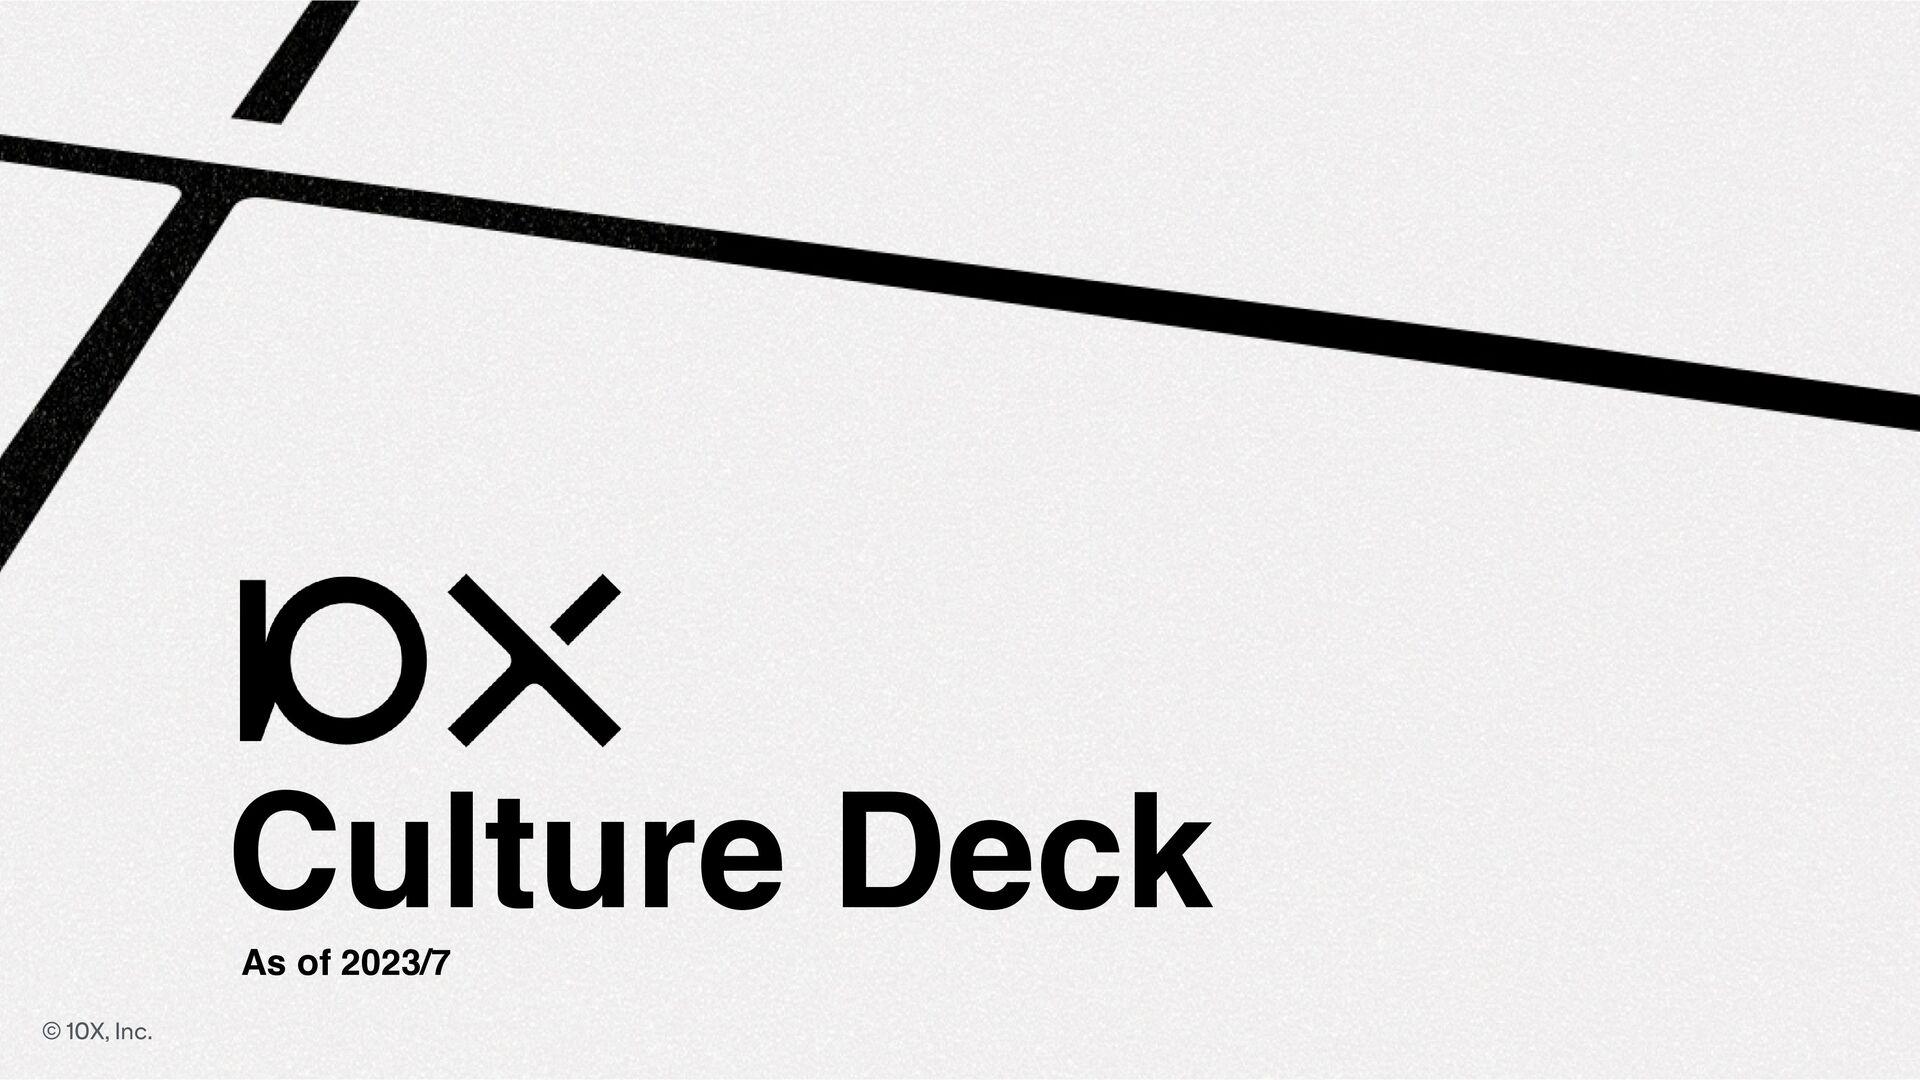 株式会社10X - Culture Deck